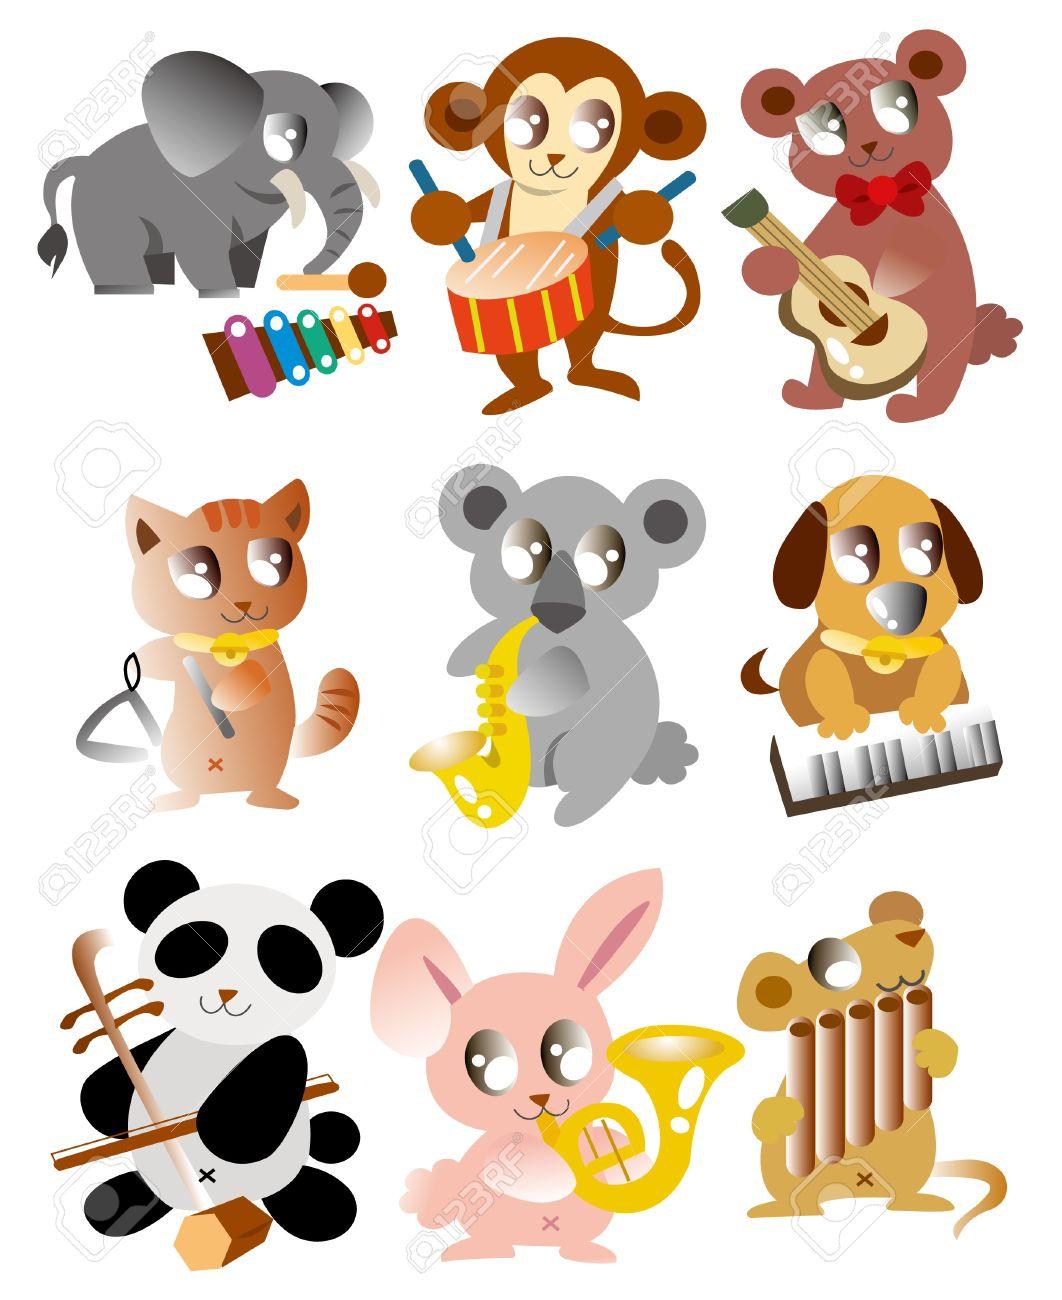 cartoon animal play music icon Stock Vector - 9427895